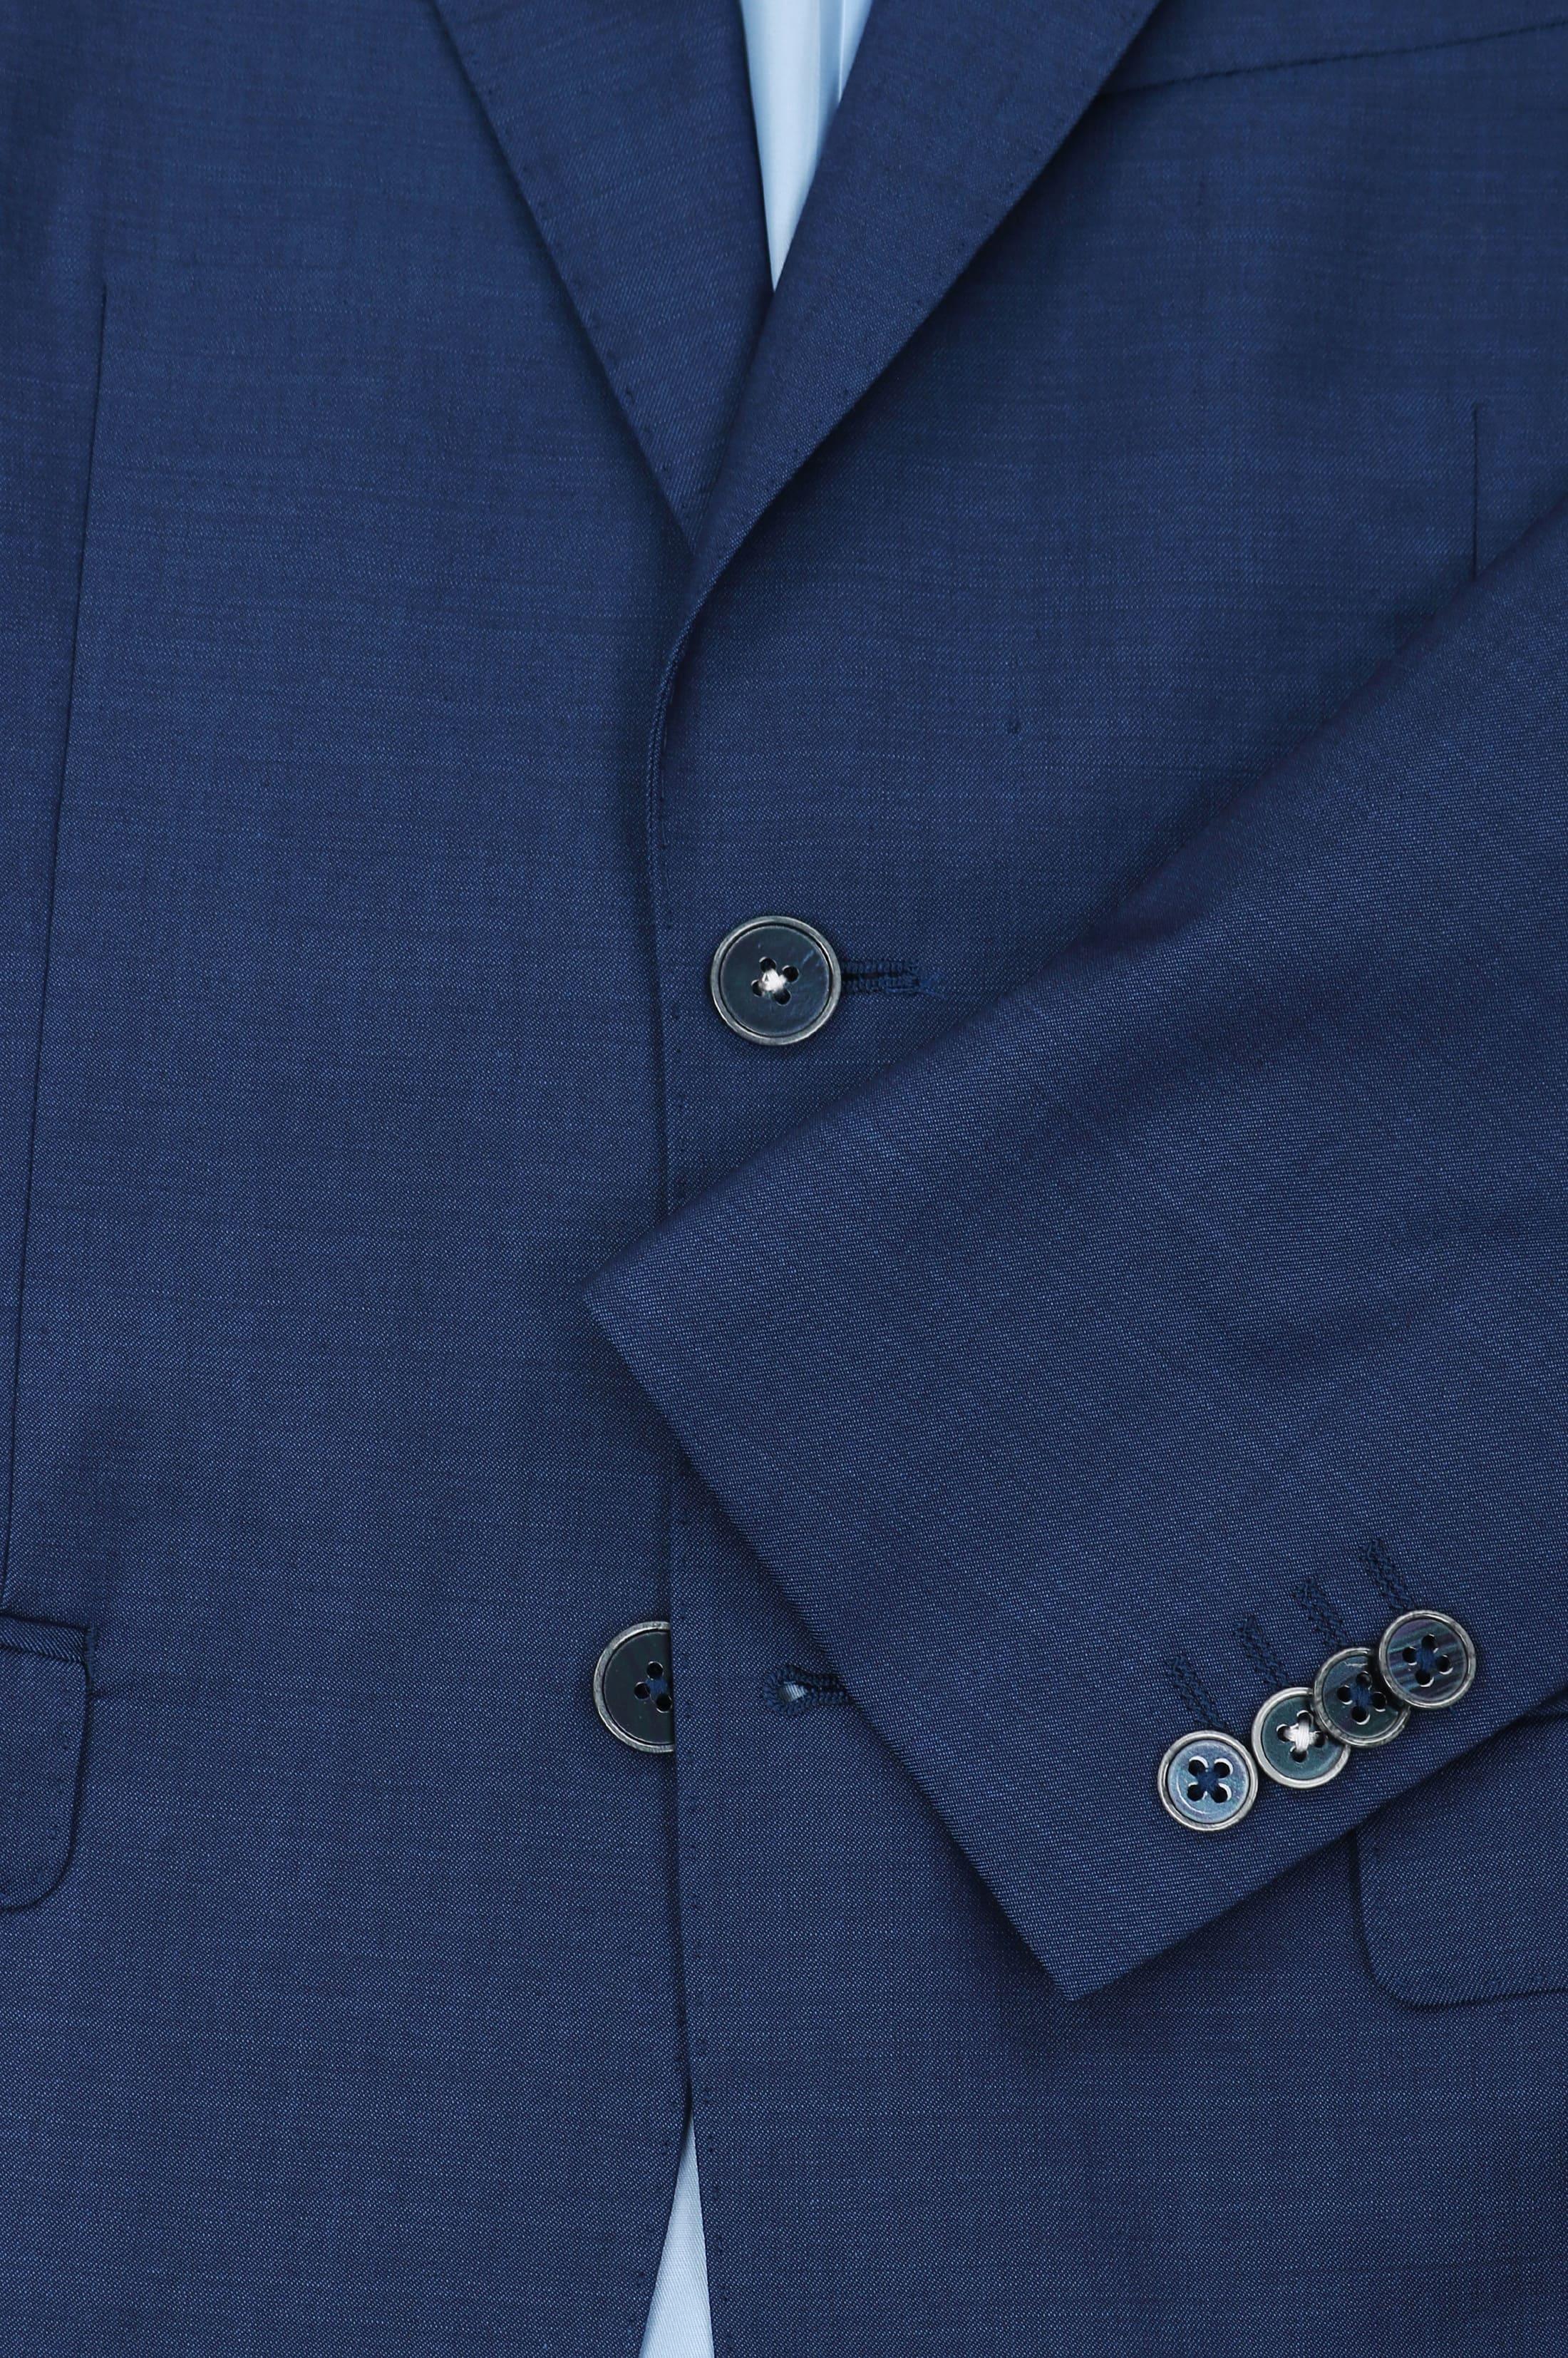 Suitable Anzug Strato Hellblau Navy foto 1